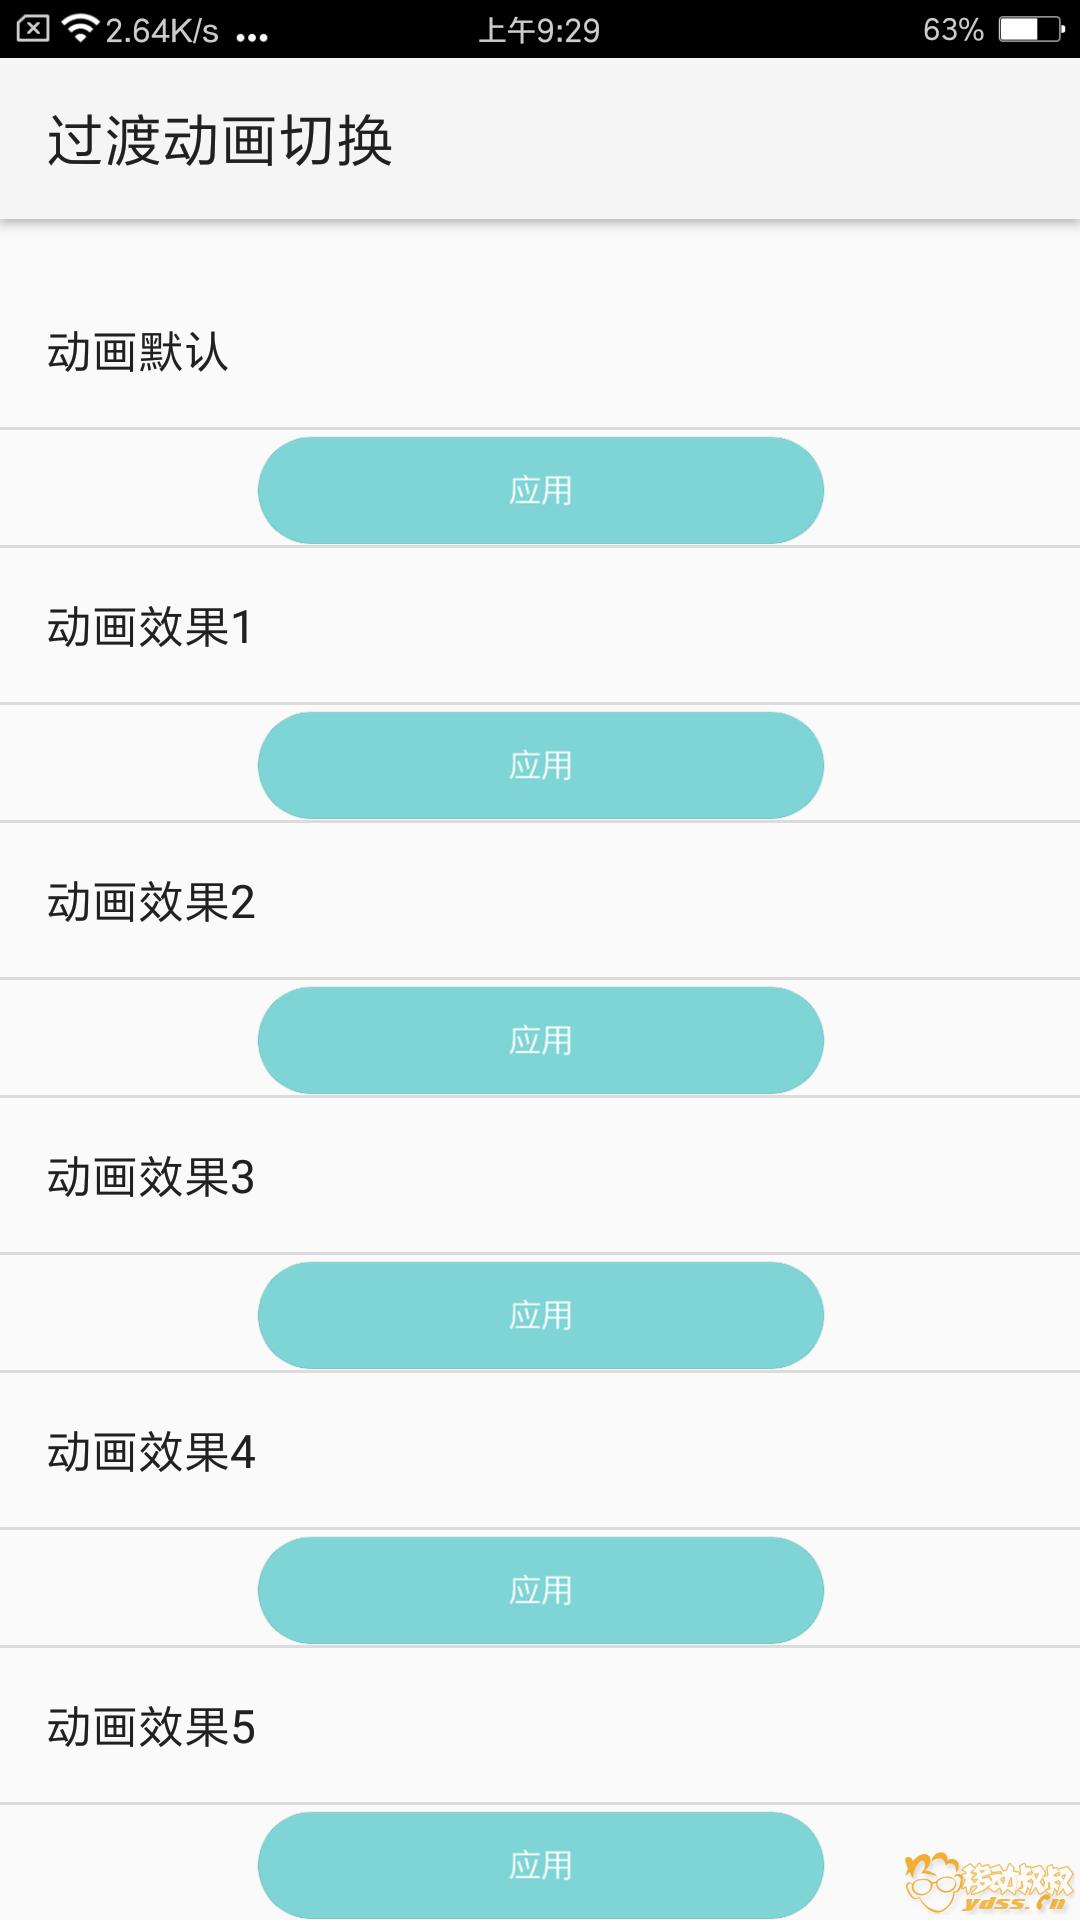 Screenshot_2018-03-13-09-29-15-944_com.nkll.settings.png